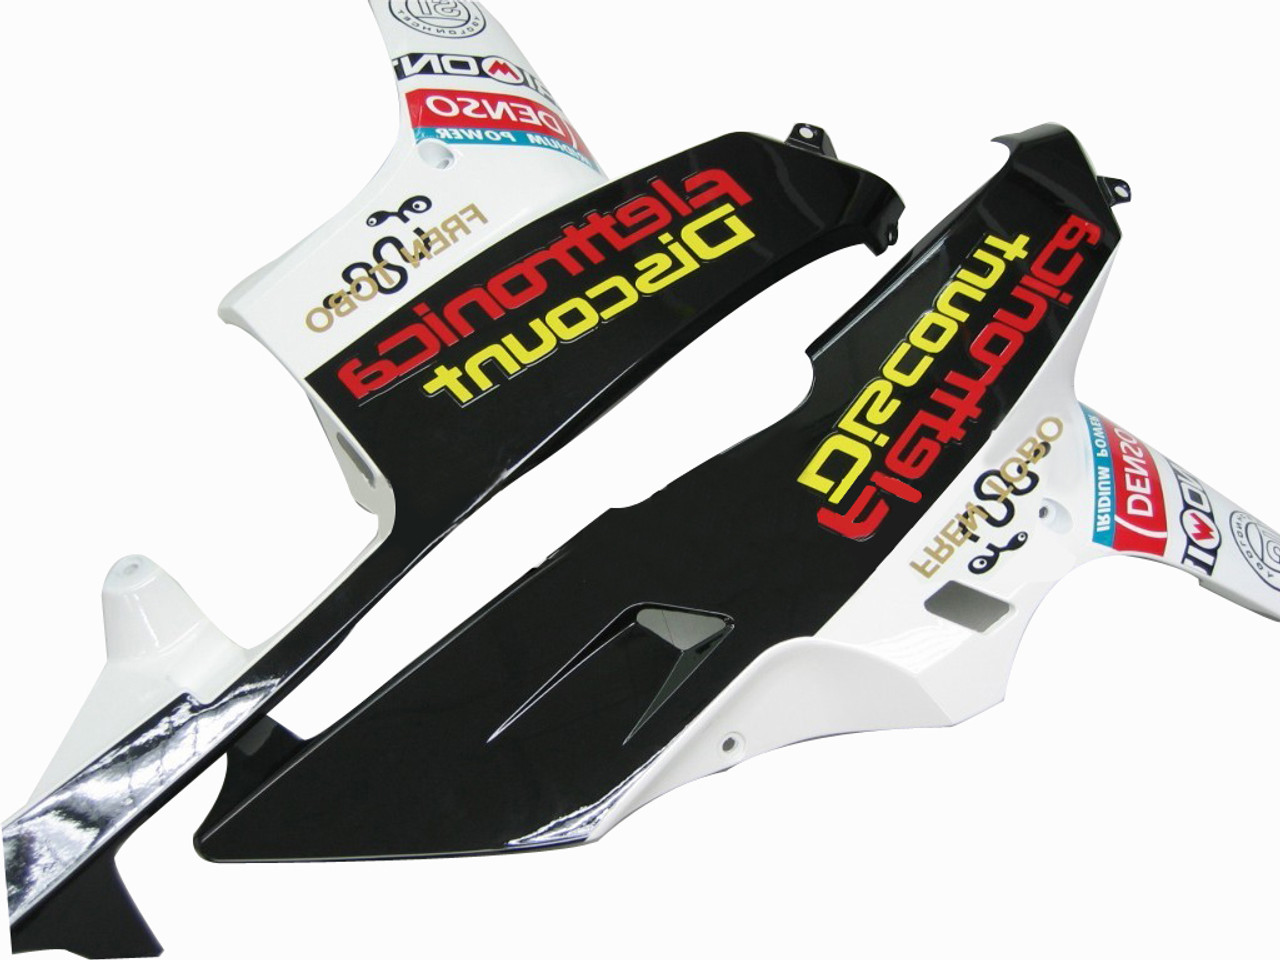 Fairings Honda CBR 600 RR Black Playboy Racing (2007-2008)